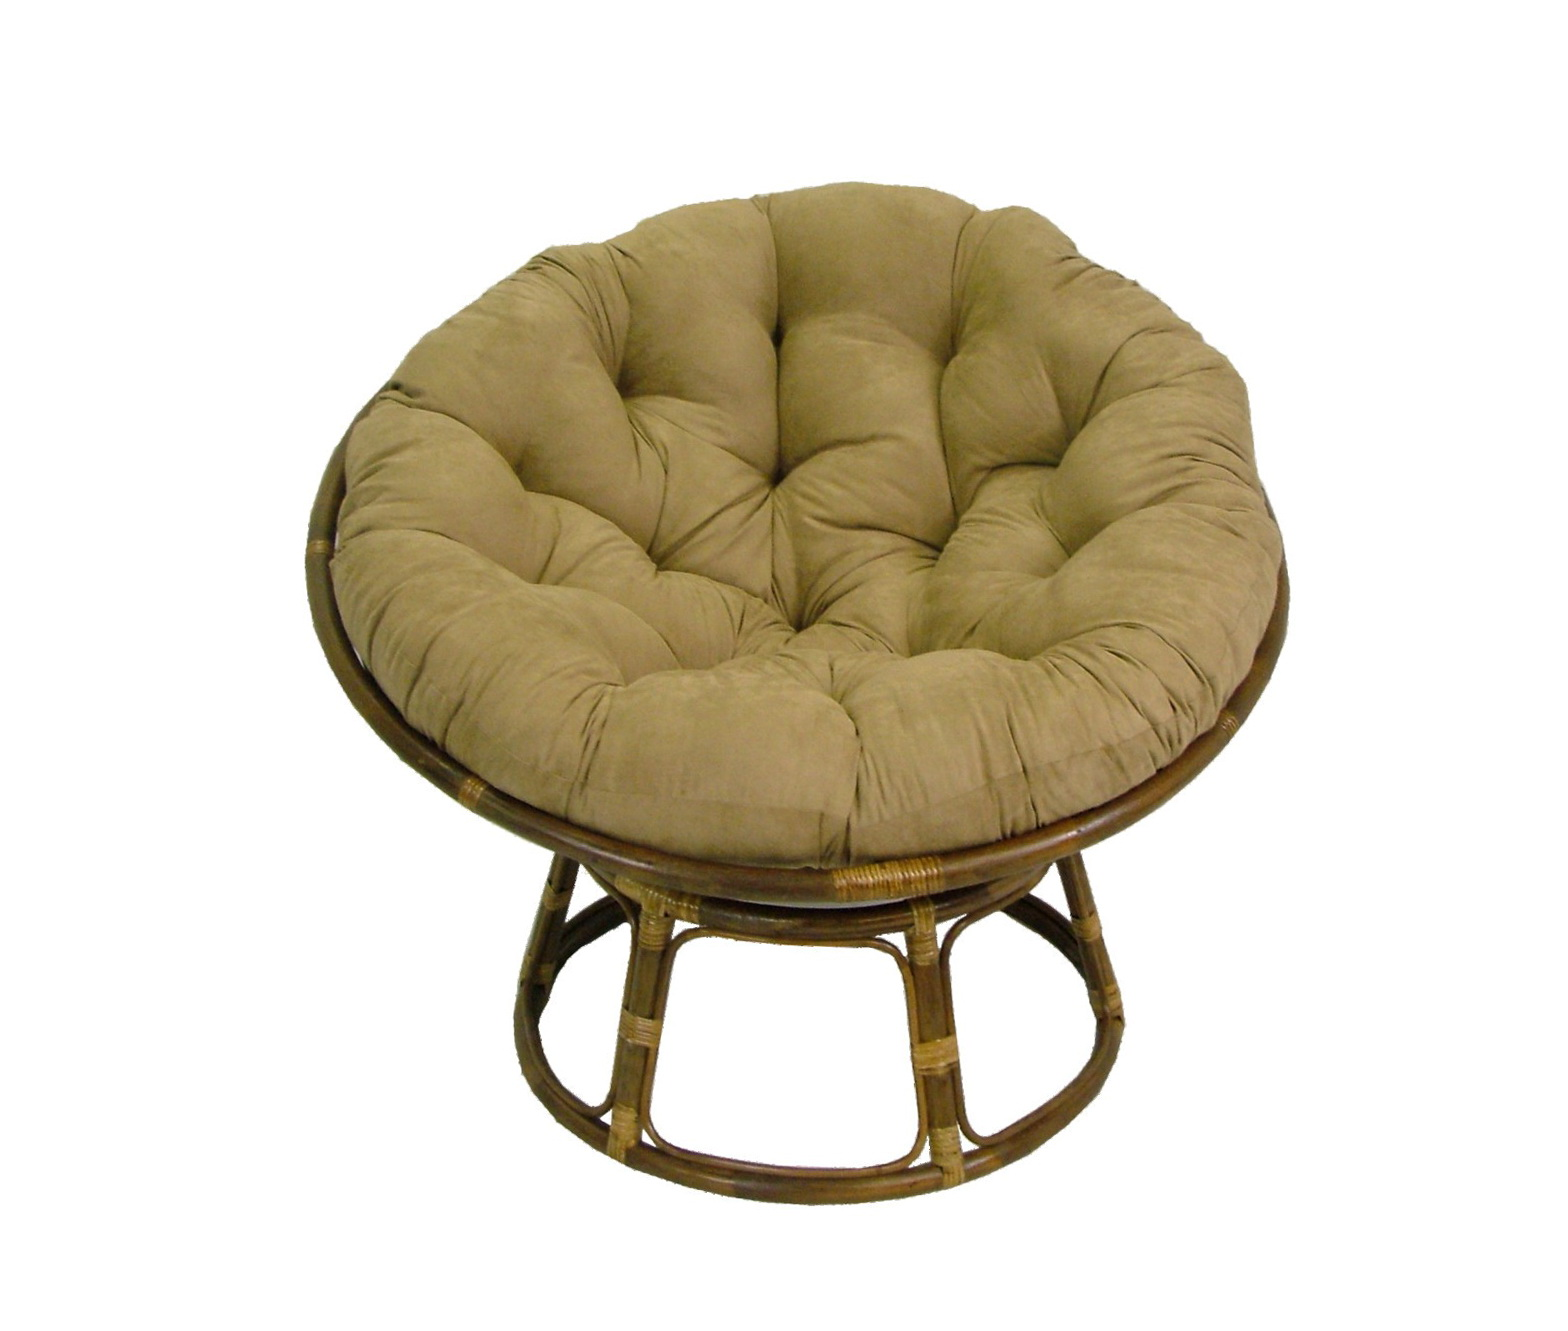 Double papasan cushion canada home design ideas for Double papasan chair cushion